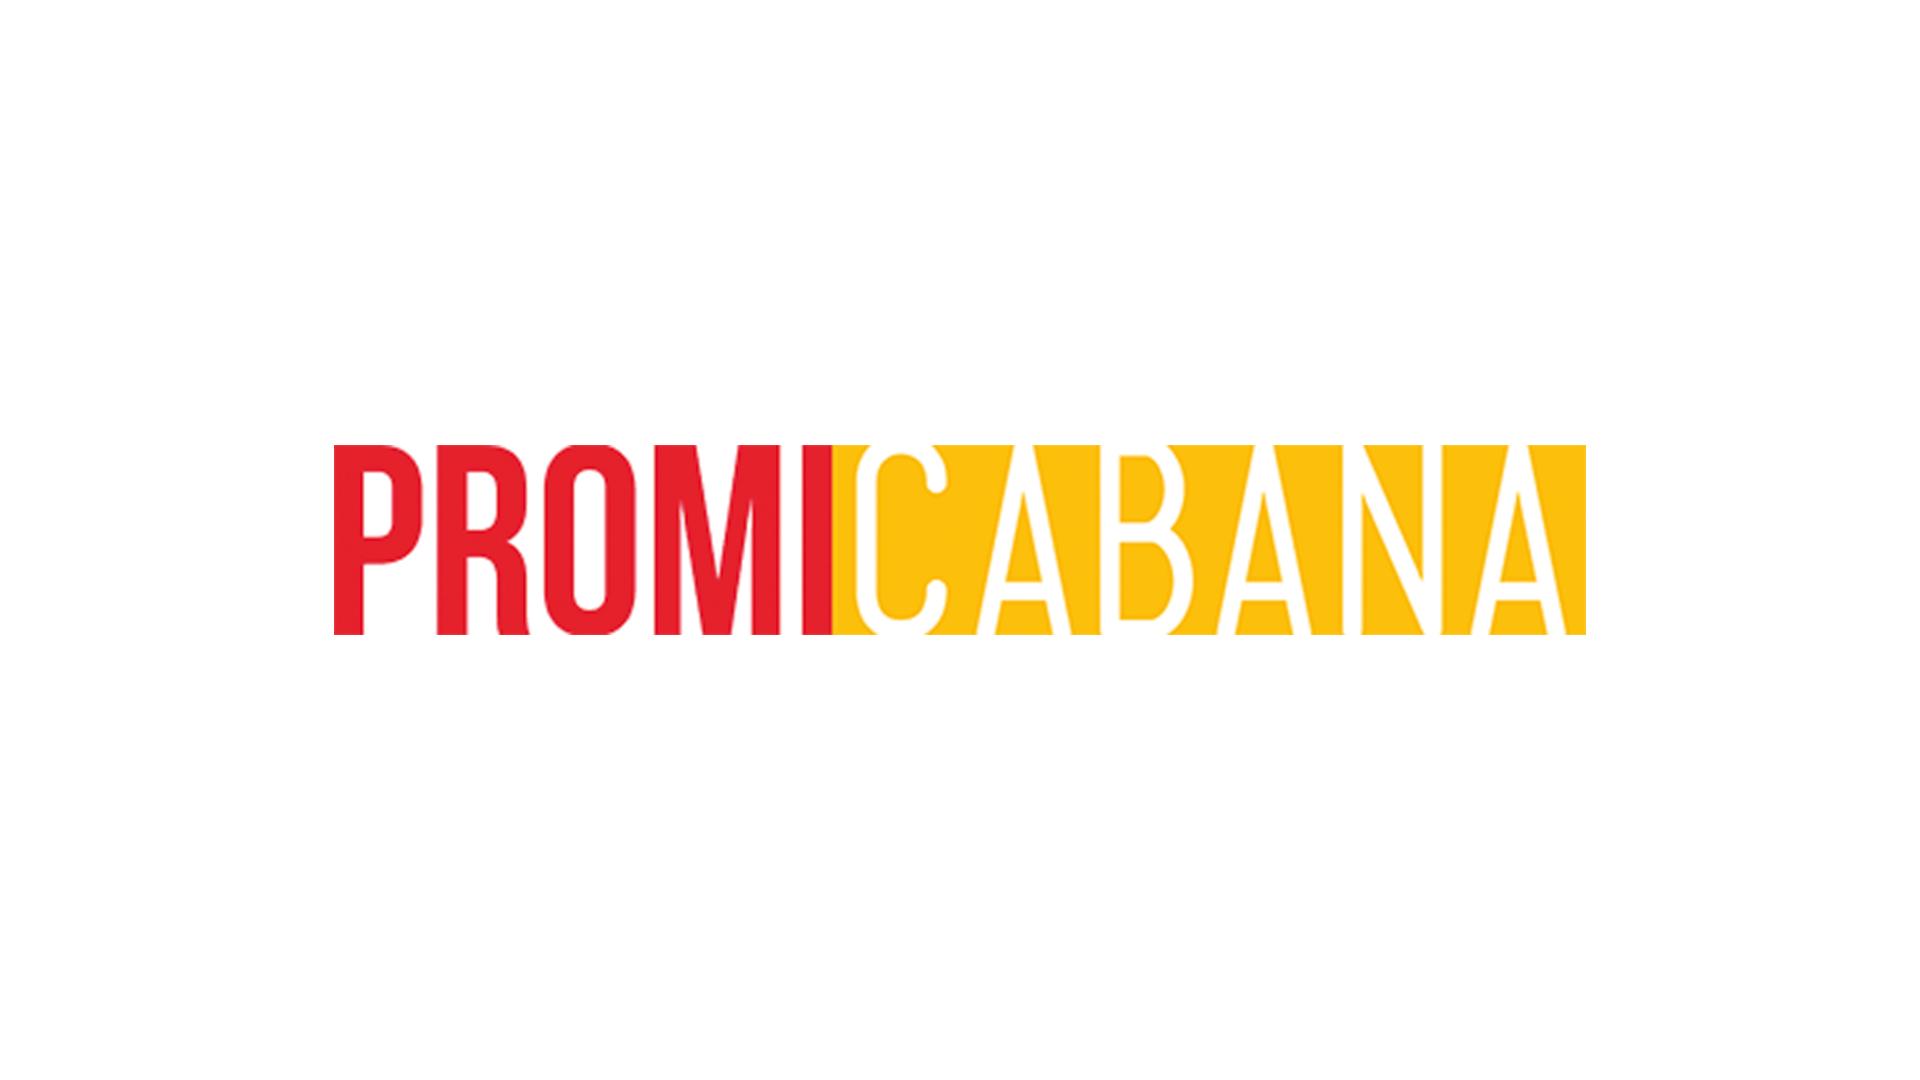 Jessica-Alba-Cash-Warren-Hilary-Duff-Sarah-Hyland-Halloween-2012